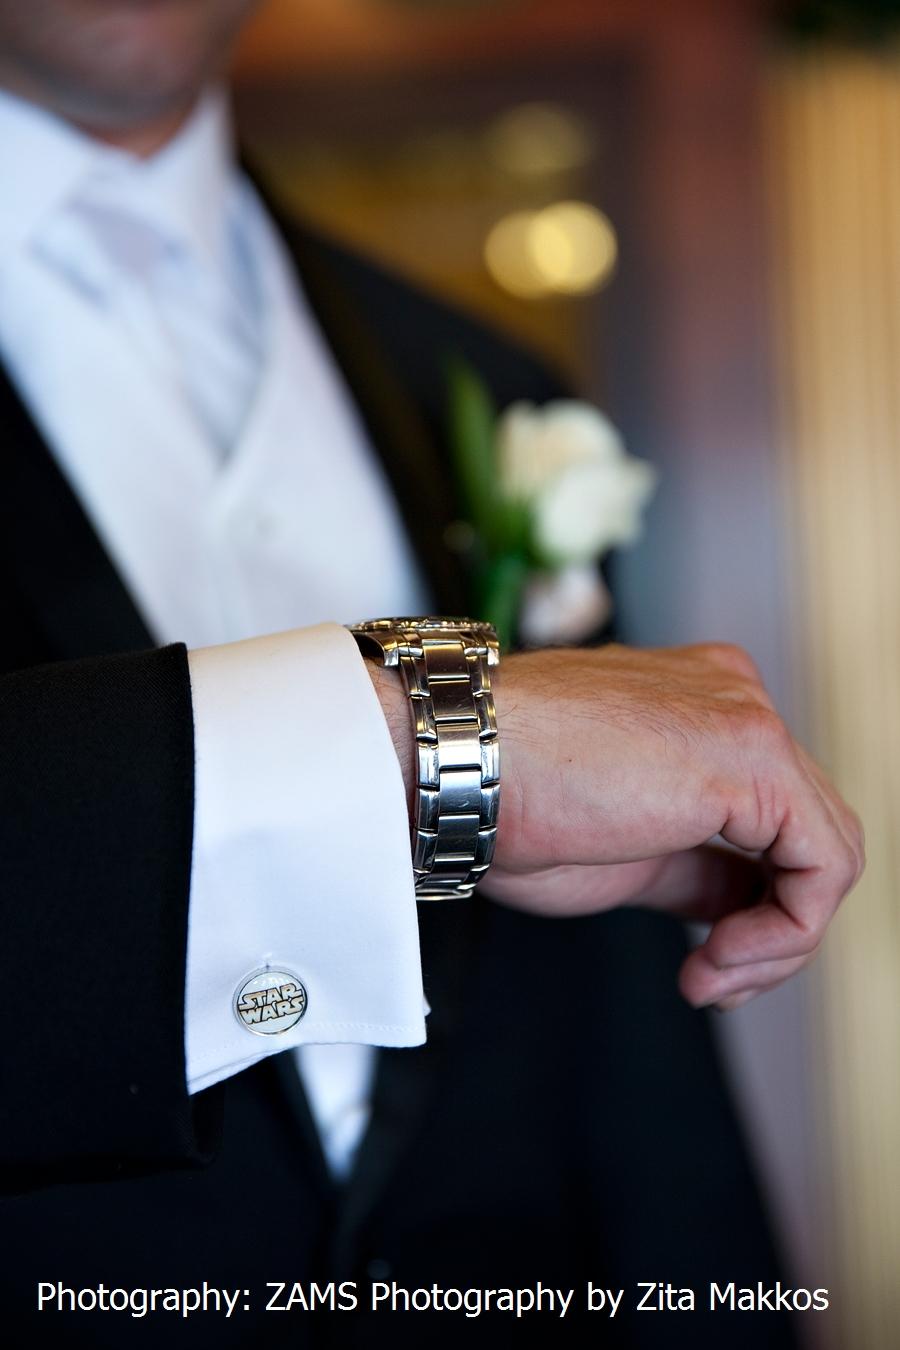 johnny_cash_quote_cuff_links_men_weddings_groomsmen_cufflinks_2.jpg